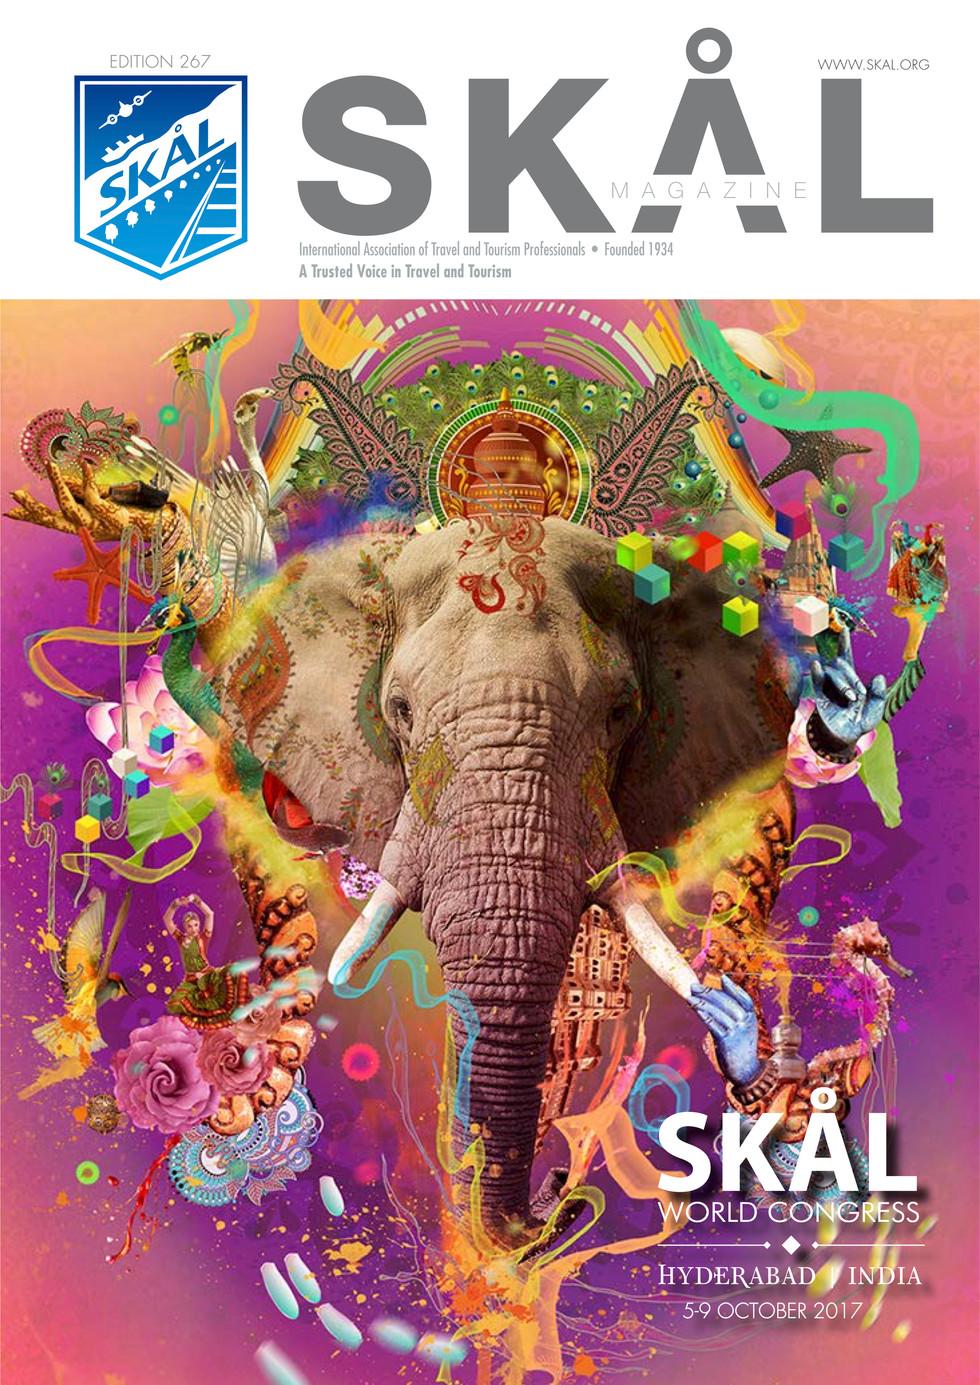 Skal Magazine No.267